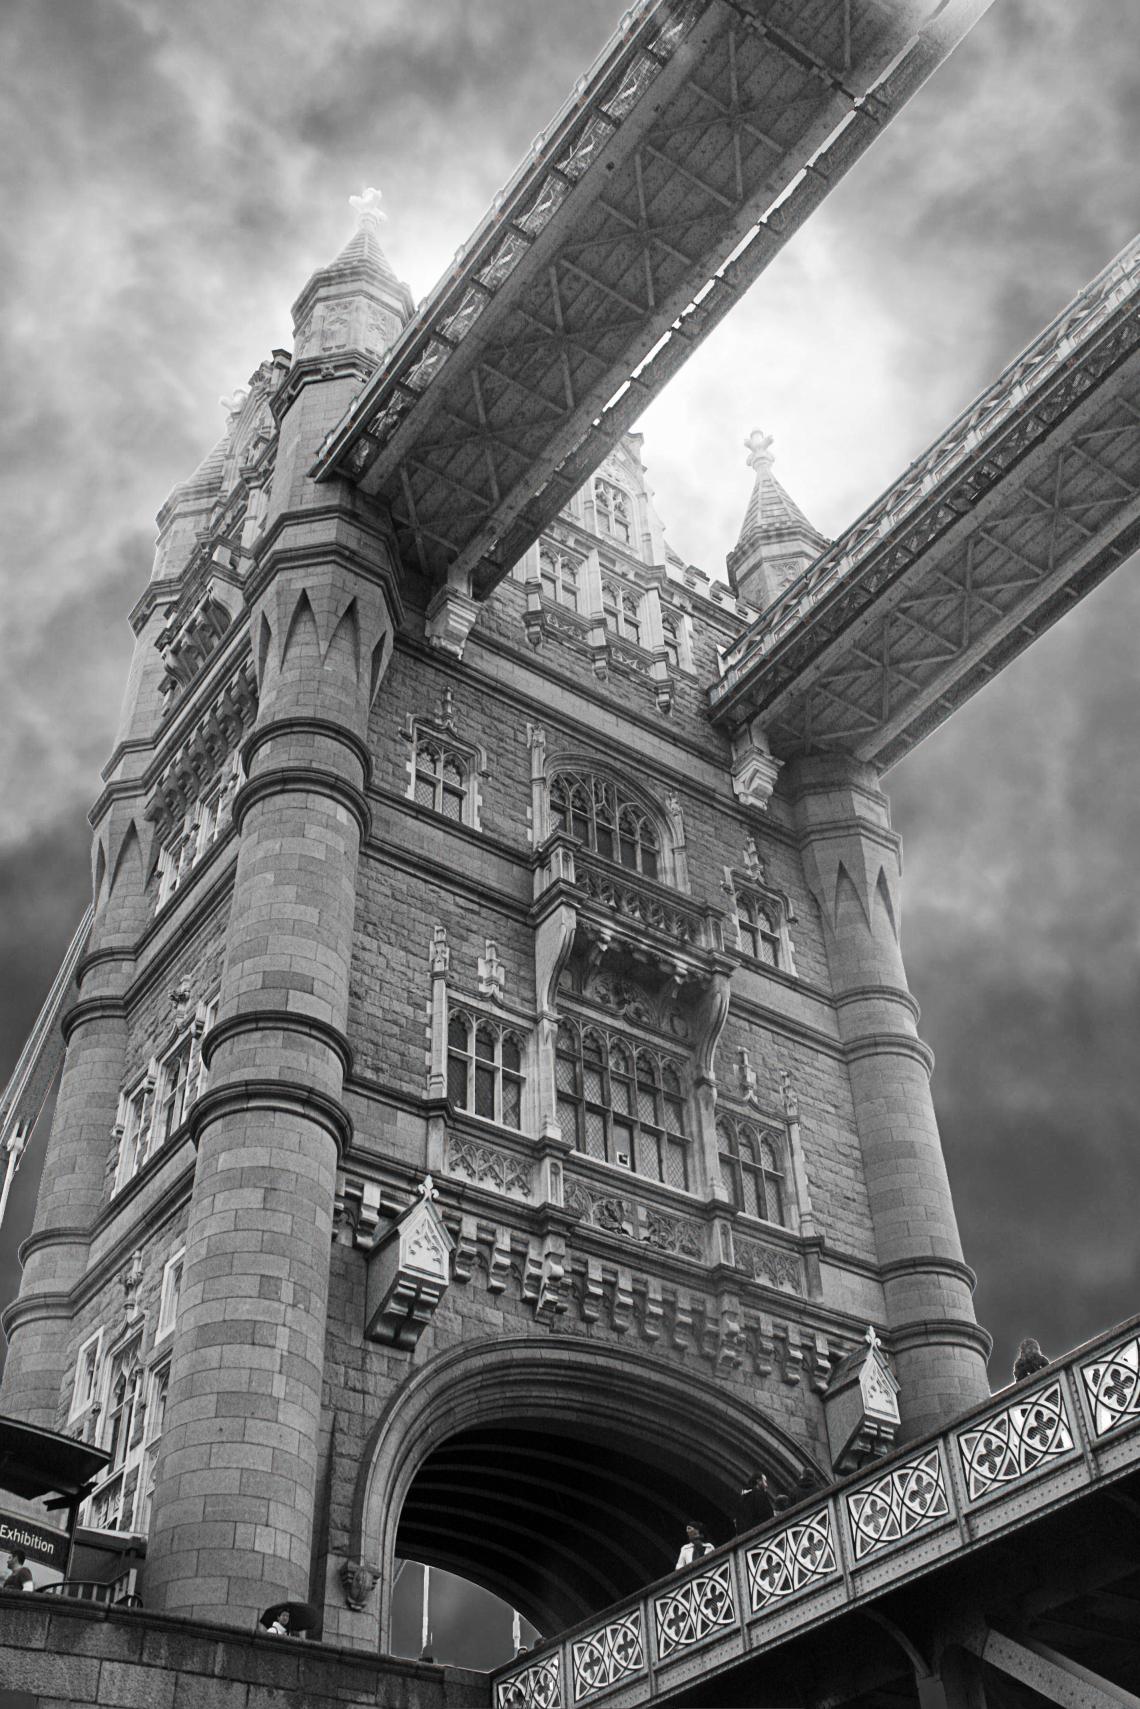 LondonTowerBridge01-IMG_3074_artistic2_monochrome